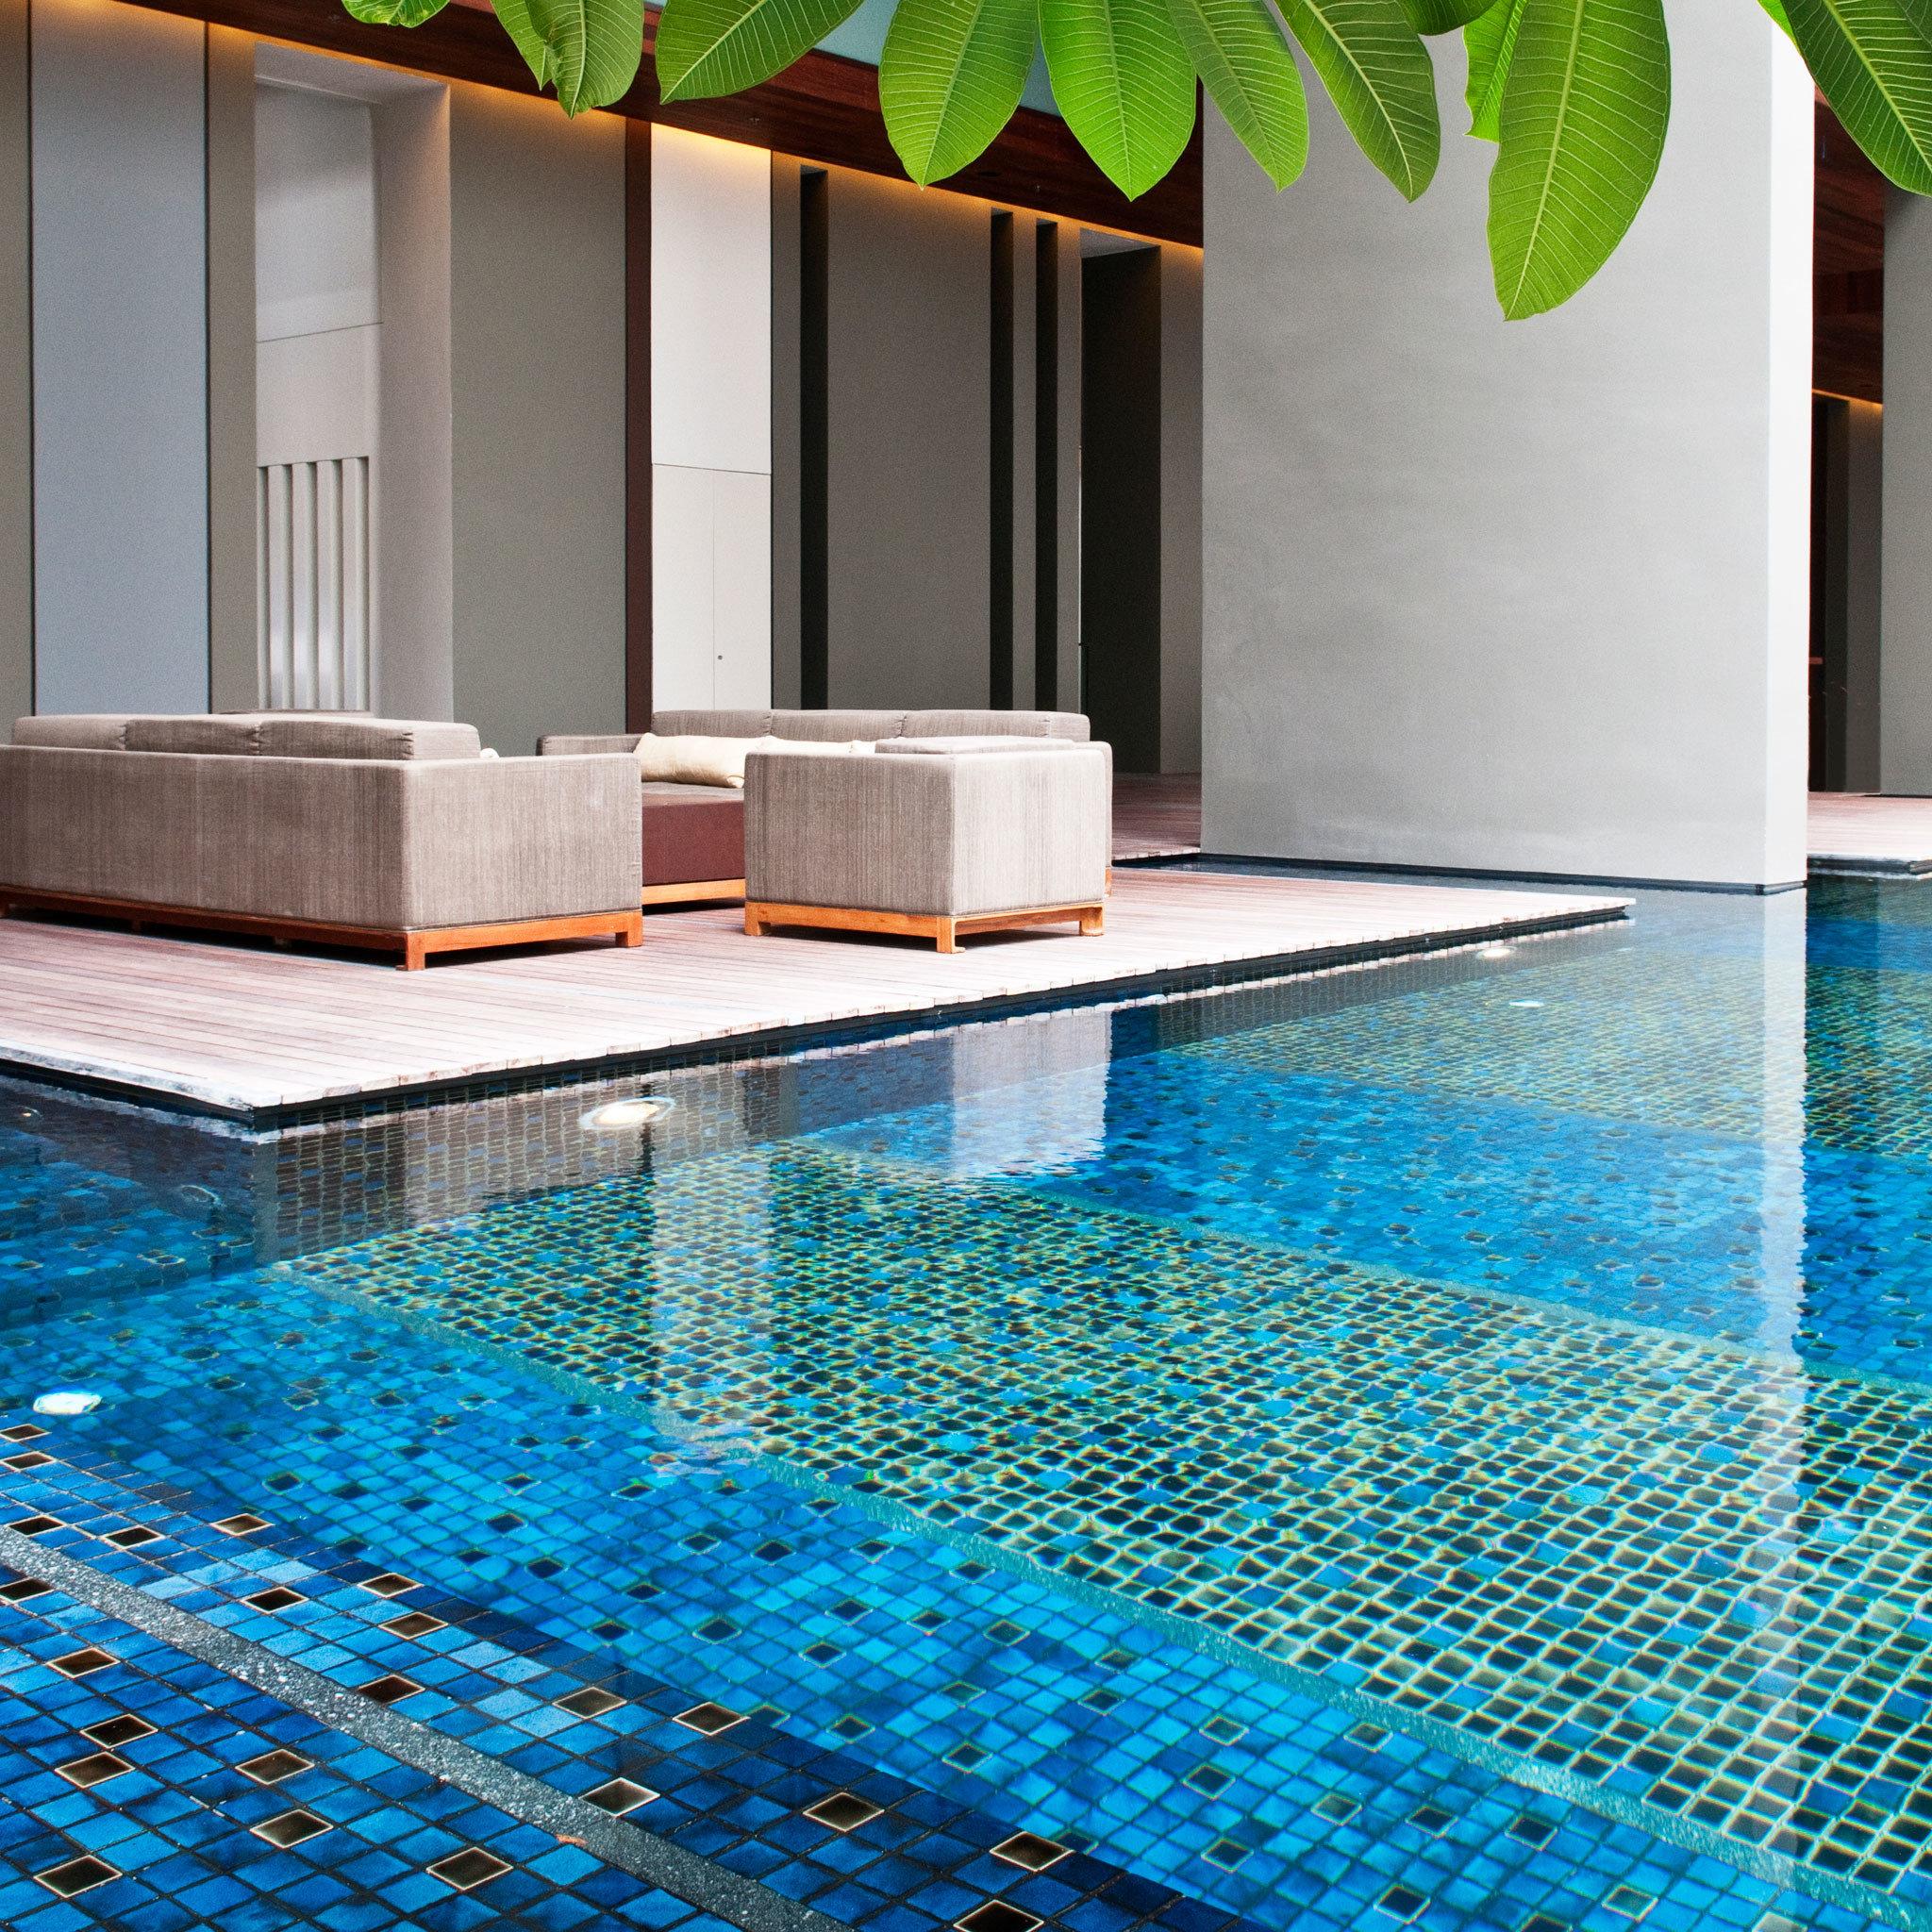 Luxury Modern Pool water swimming pool leisure swimming flooring blue backyard